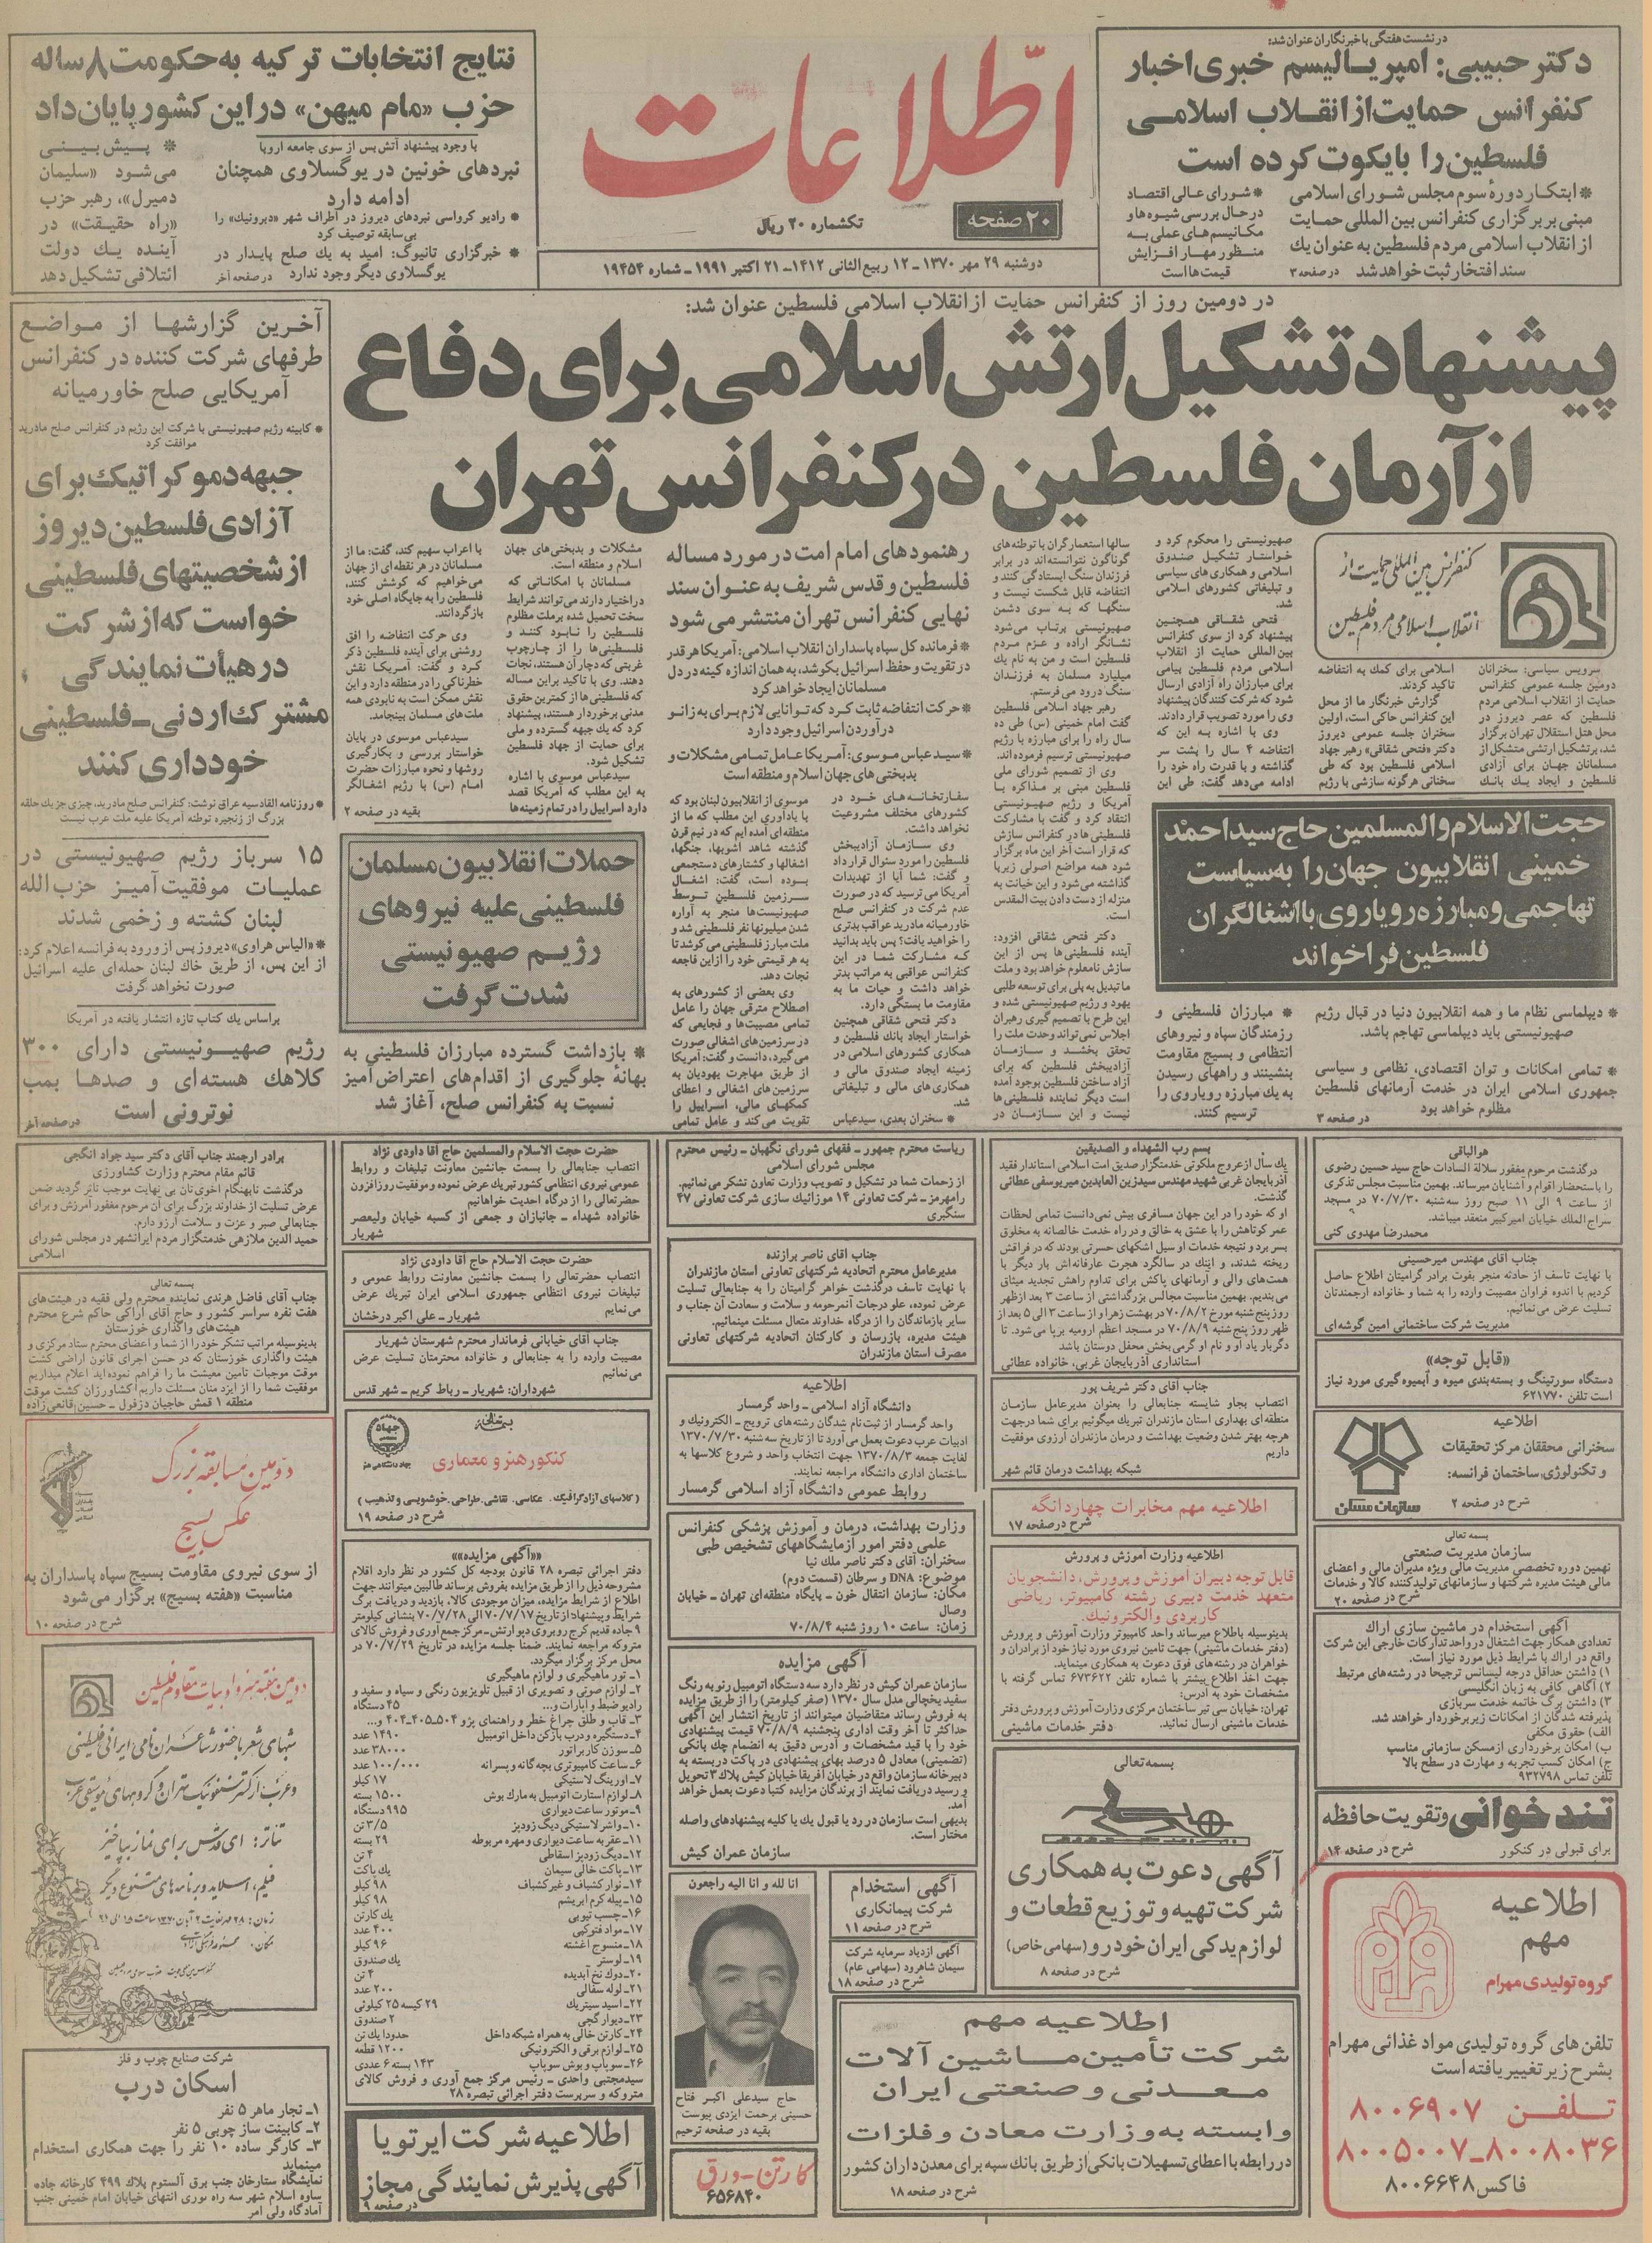 اطلاعات 29 مهر 1370